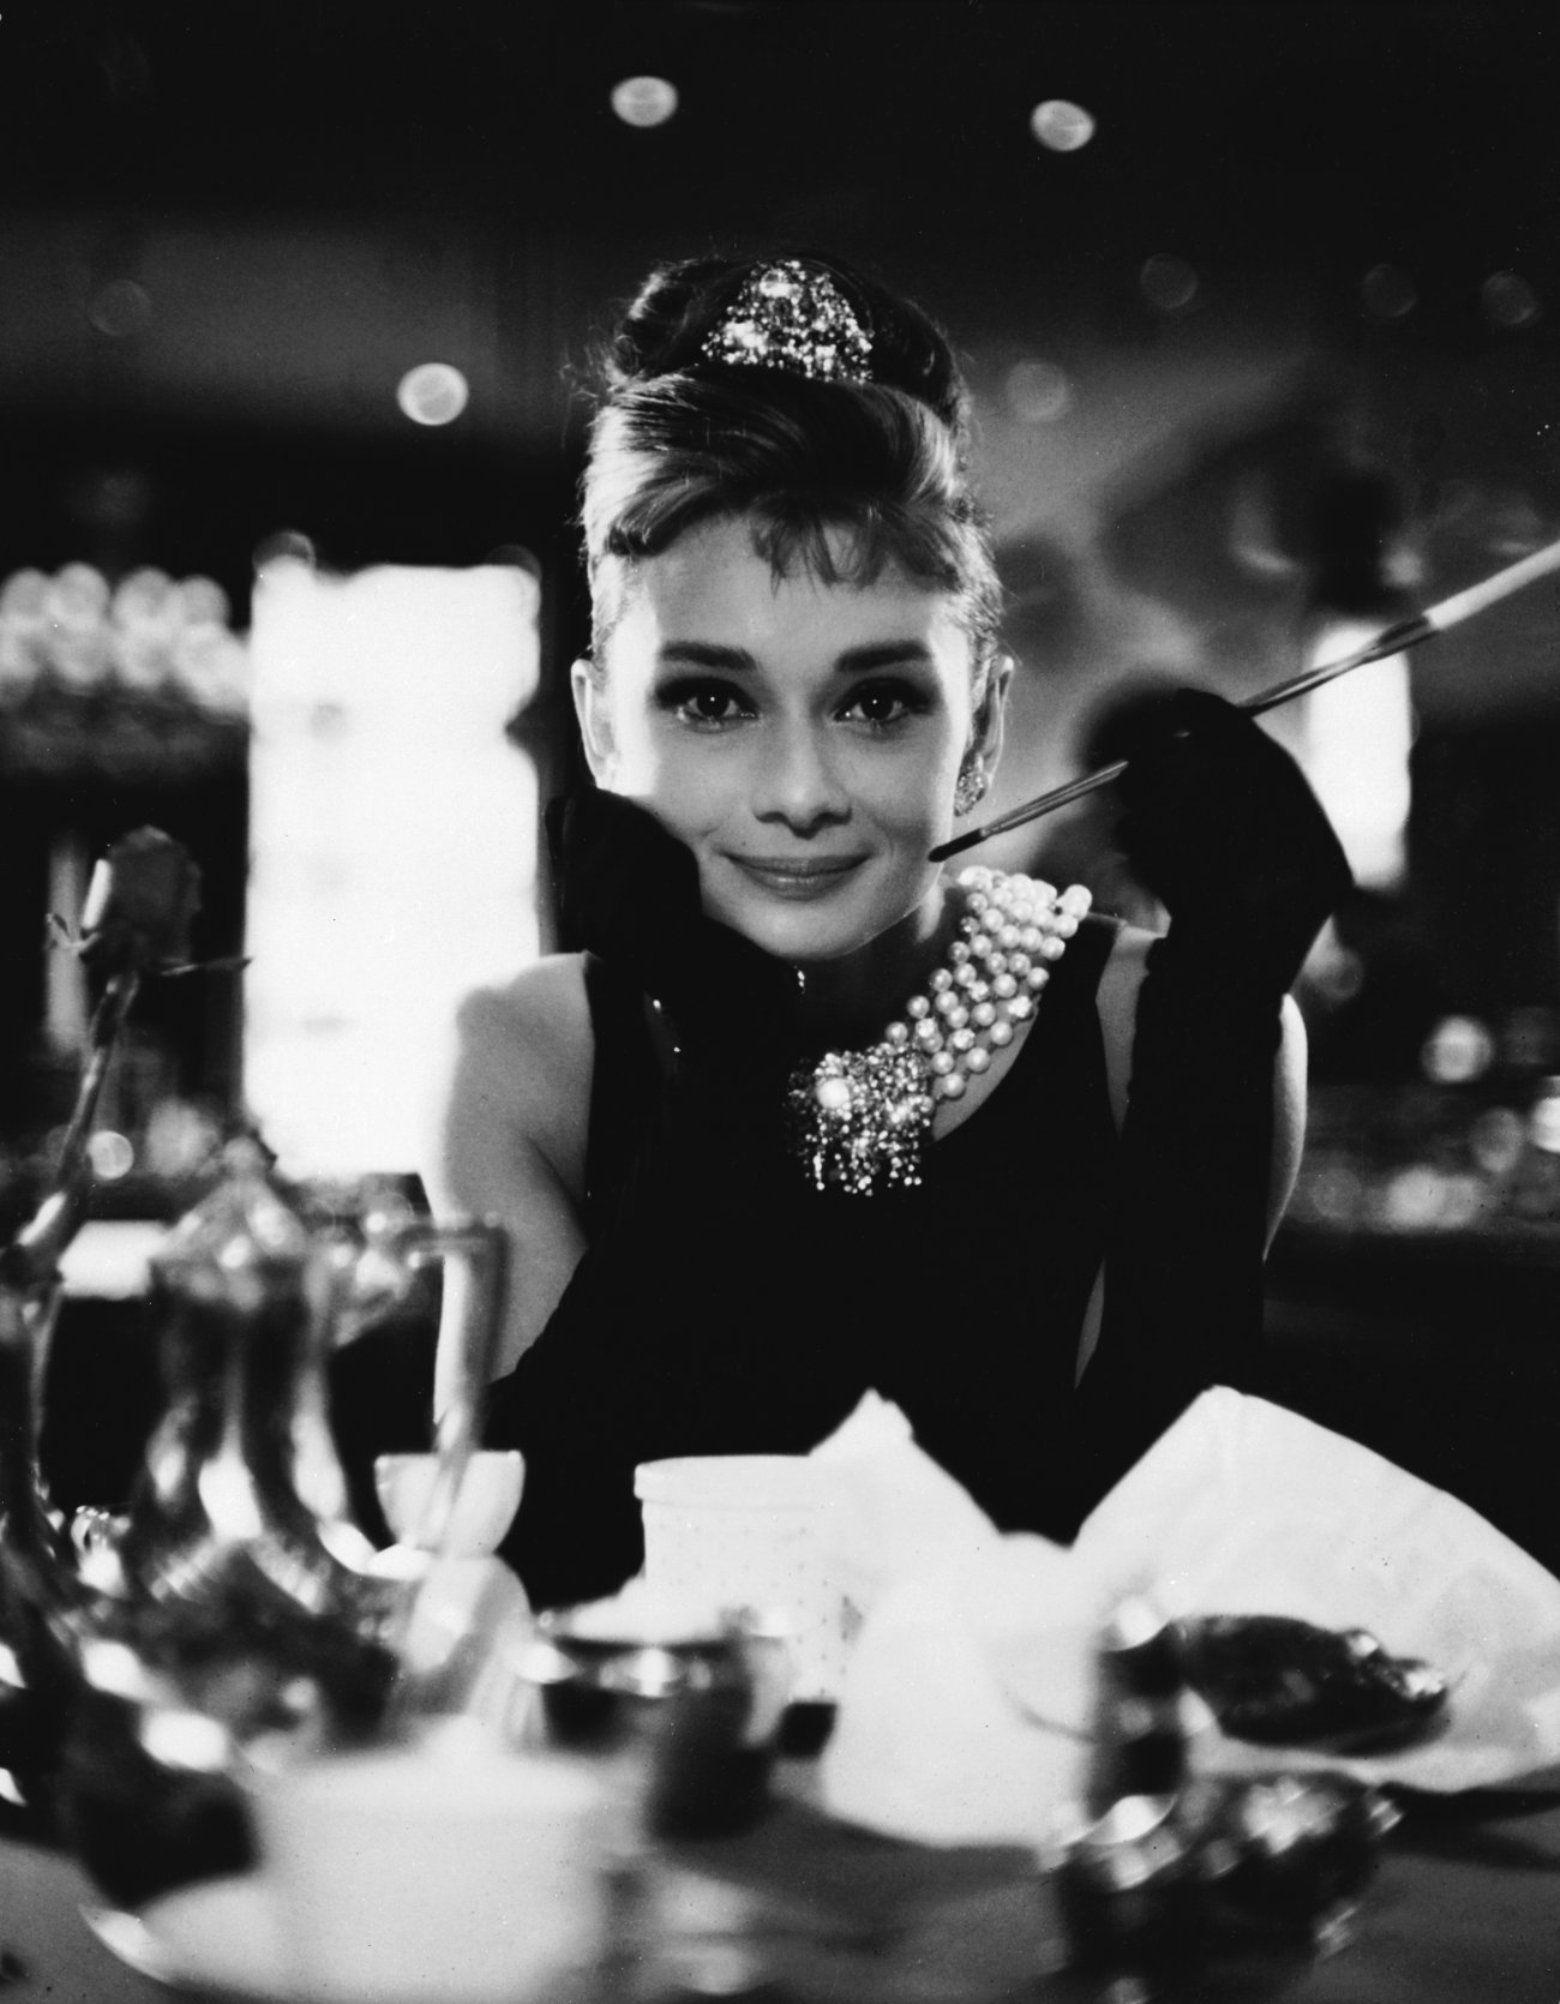 Breakfast at Tiffanys - Audrey Hepburn | Films and readings ...